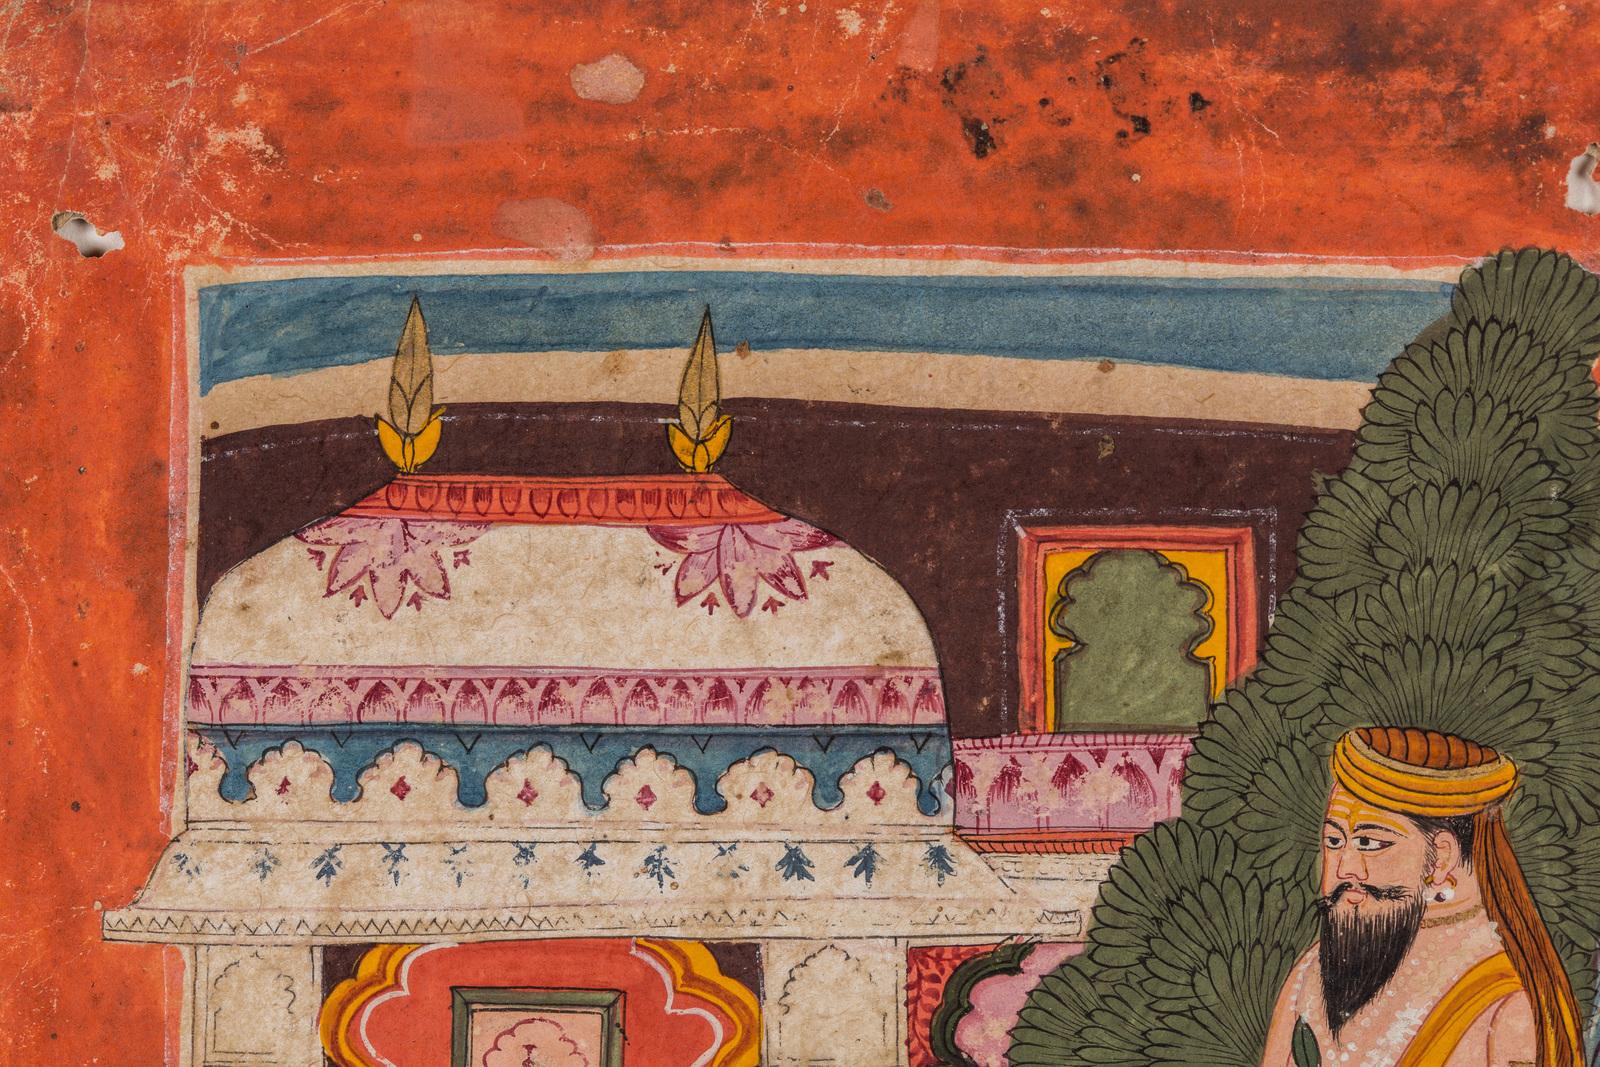 INDIA - Image 5 of 6